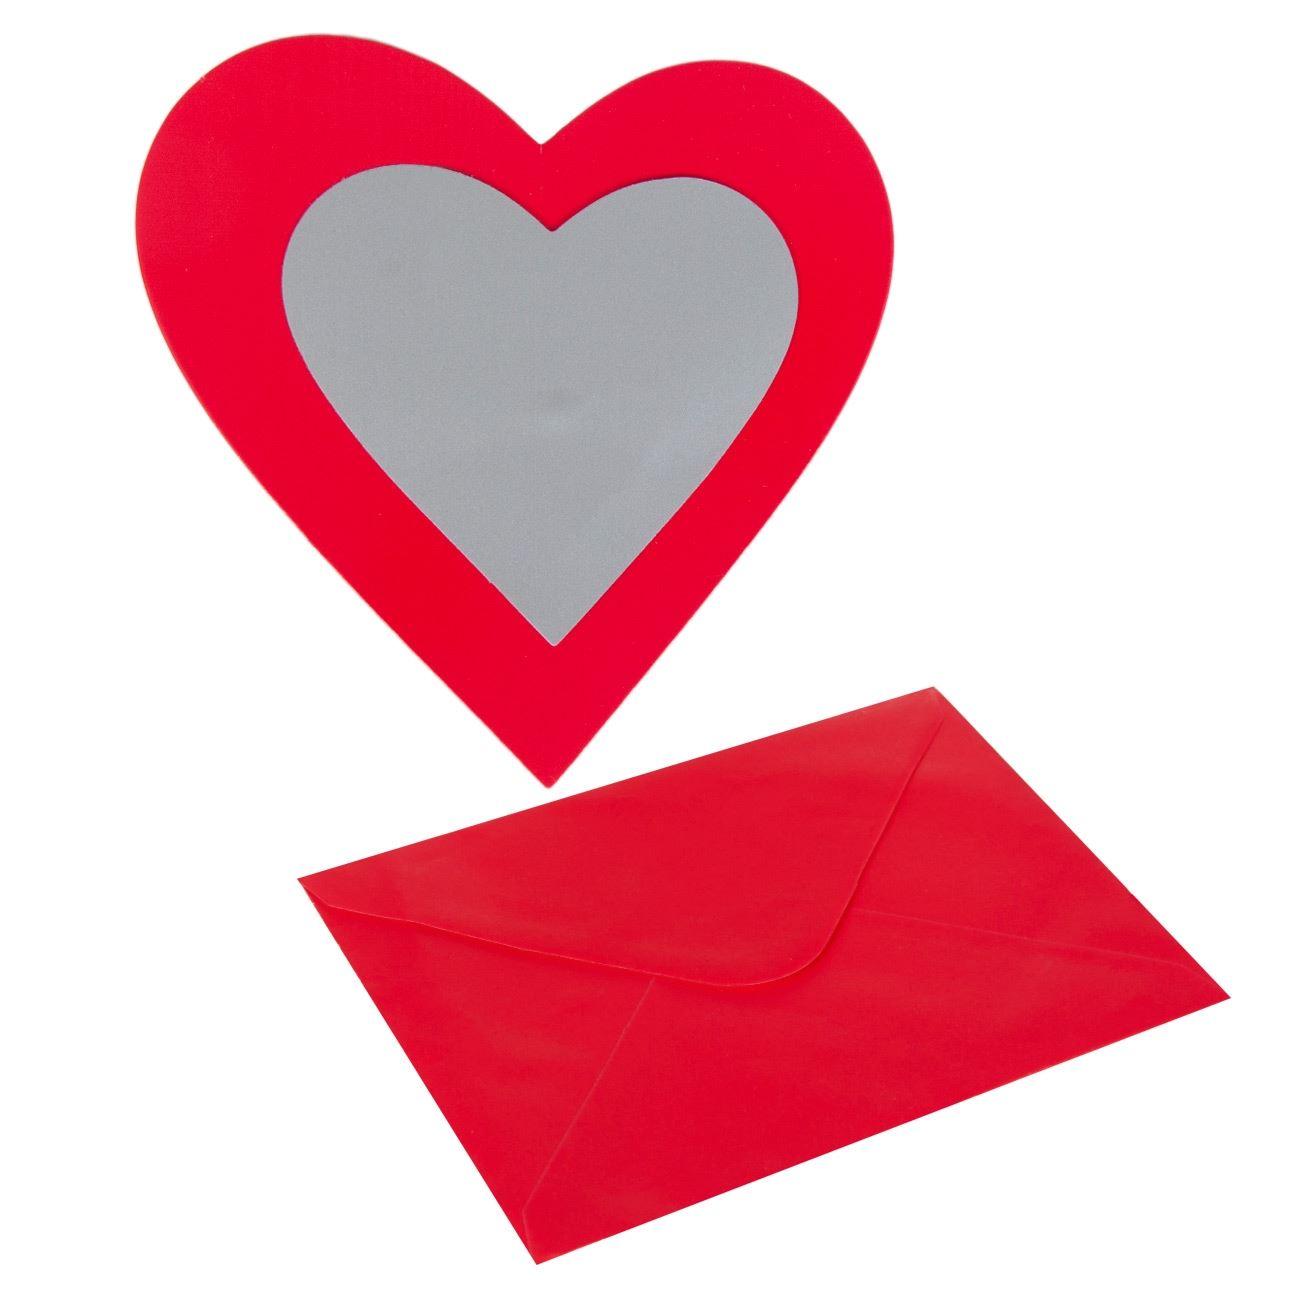 2c983937016c Καρδιά Ξυστό Μηνυμάτων Φάκελος Κόκκινος 16x12   Ευχετήριες Κάρτες Ξυστό